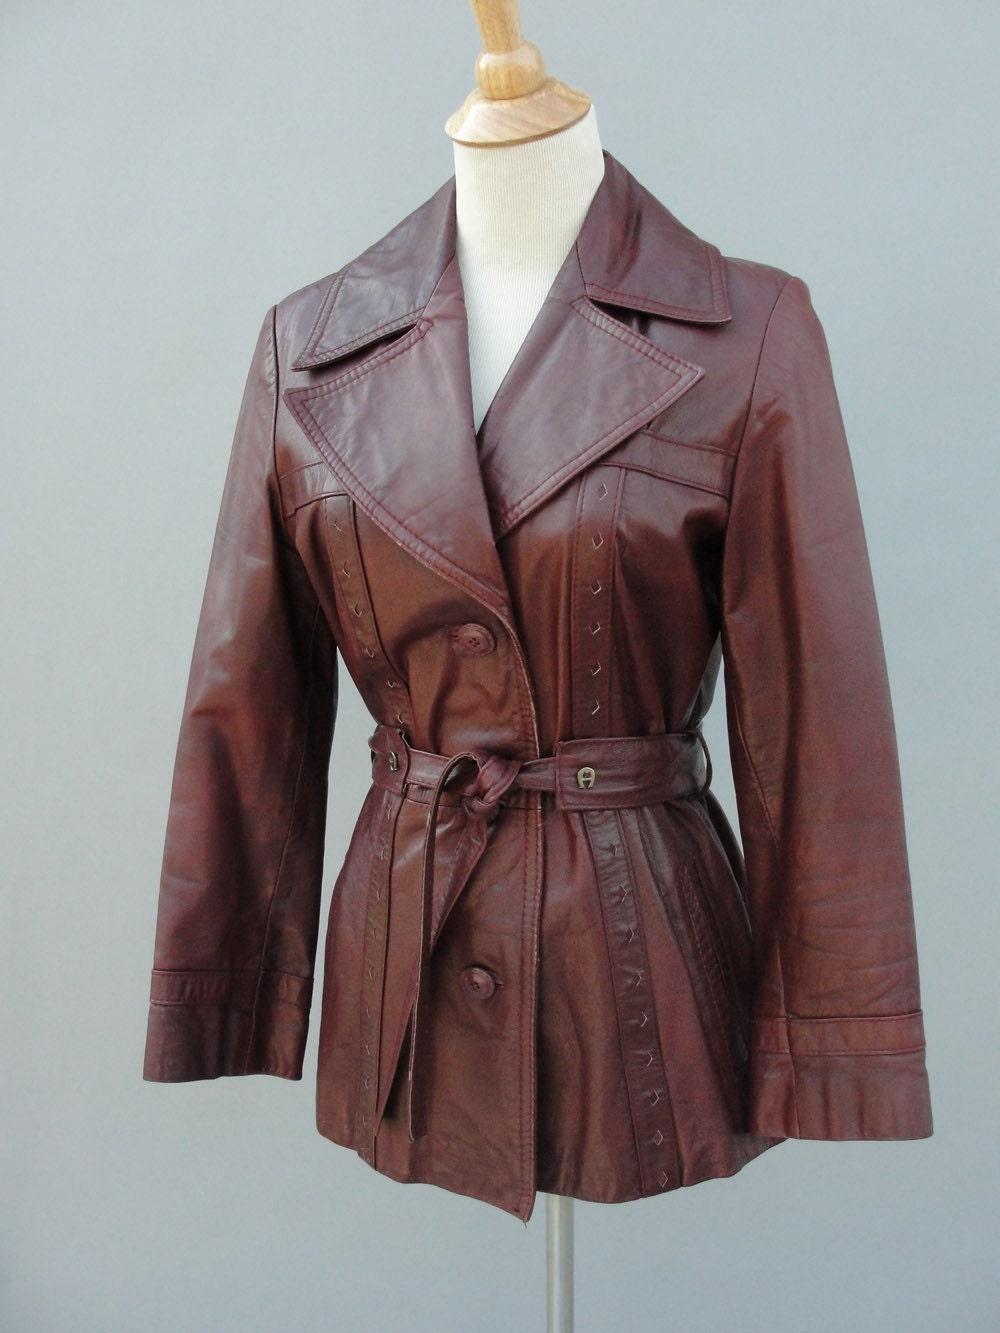 VINTAGE 1970s ETIENNE AIGNER Leather Blazer Jacket